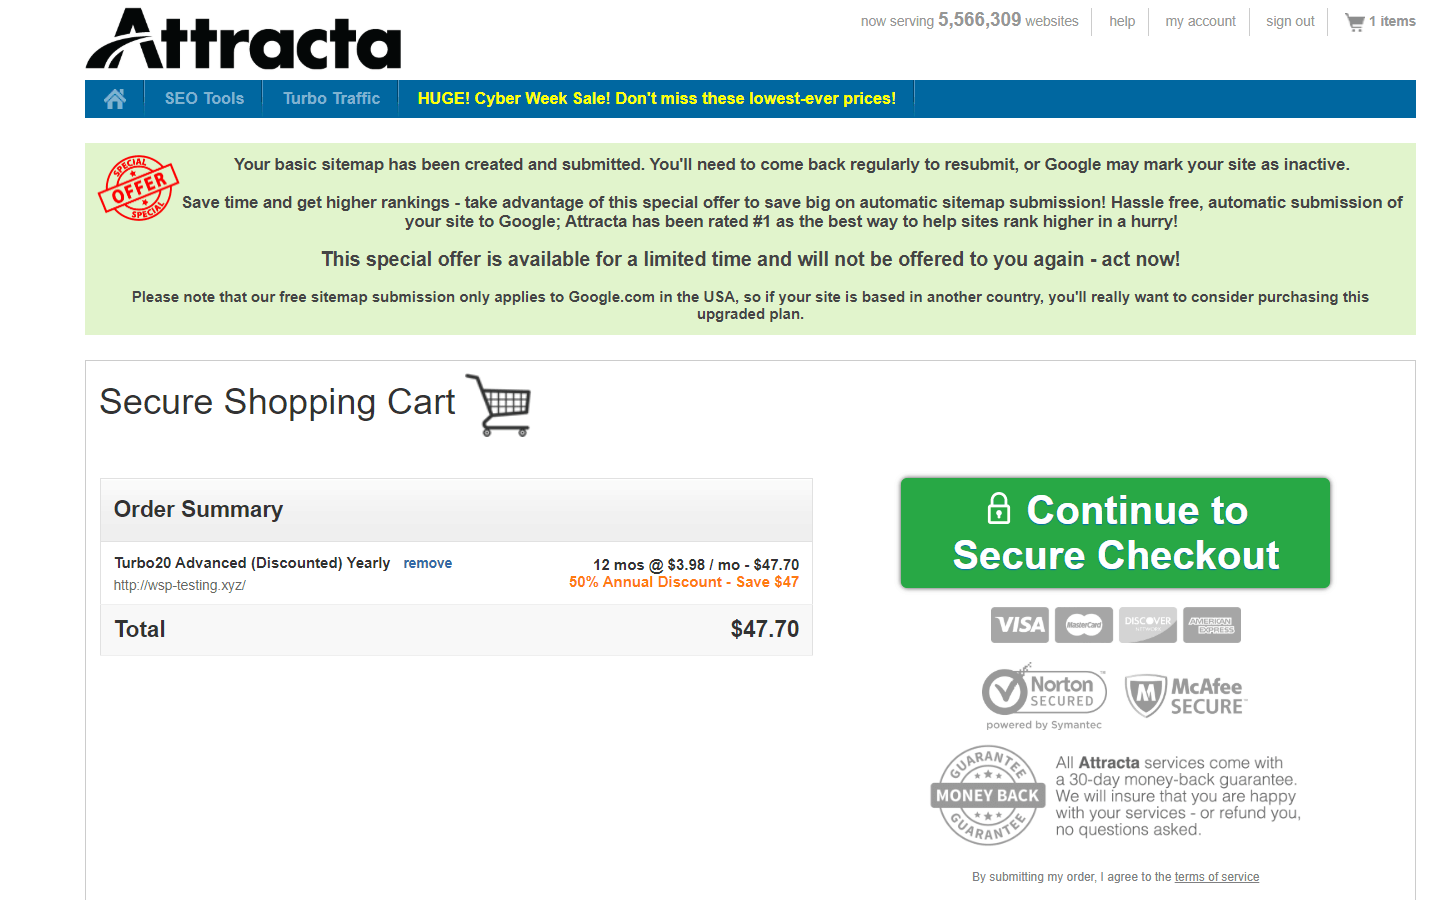 Scala Hosting review - Attracta screenshot